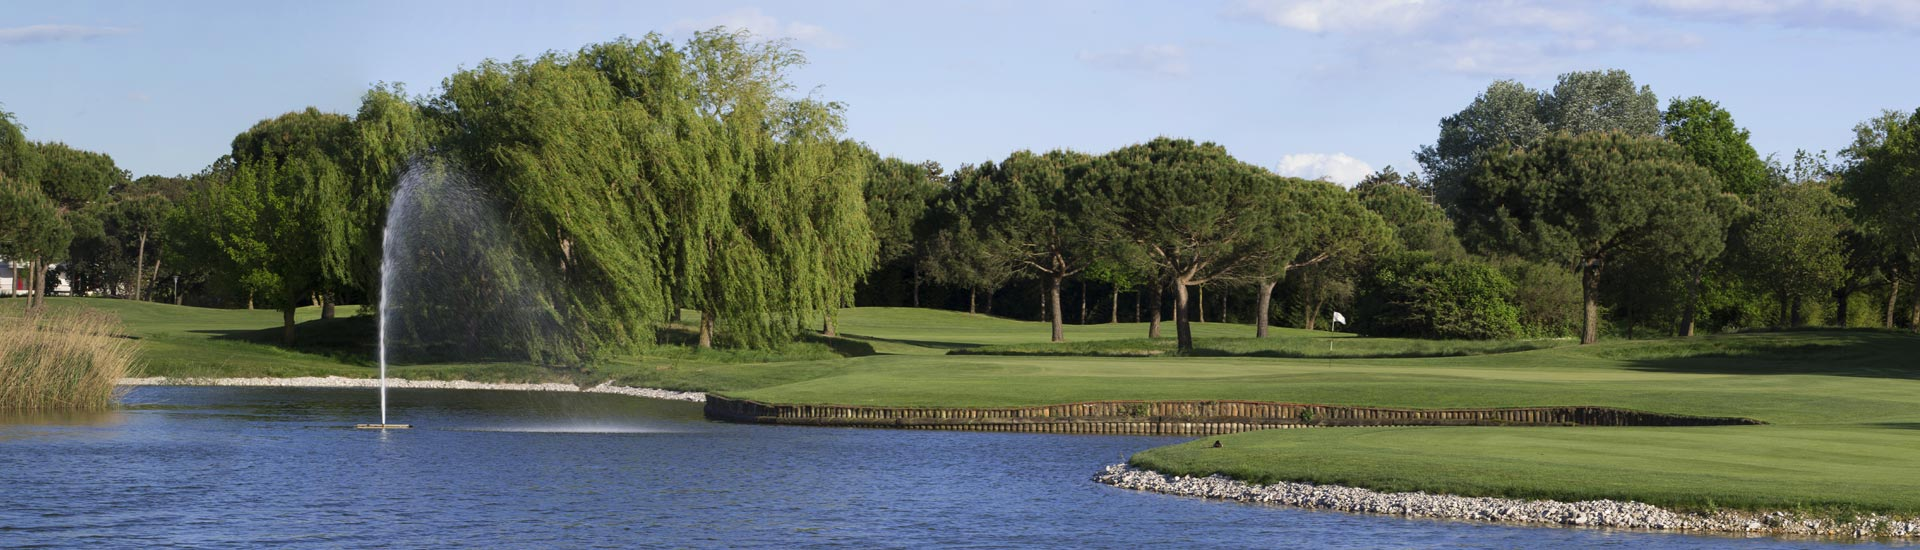 golf_club_Lignano_Friuli-Venezia-Giulia_1